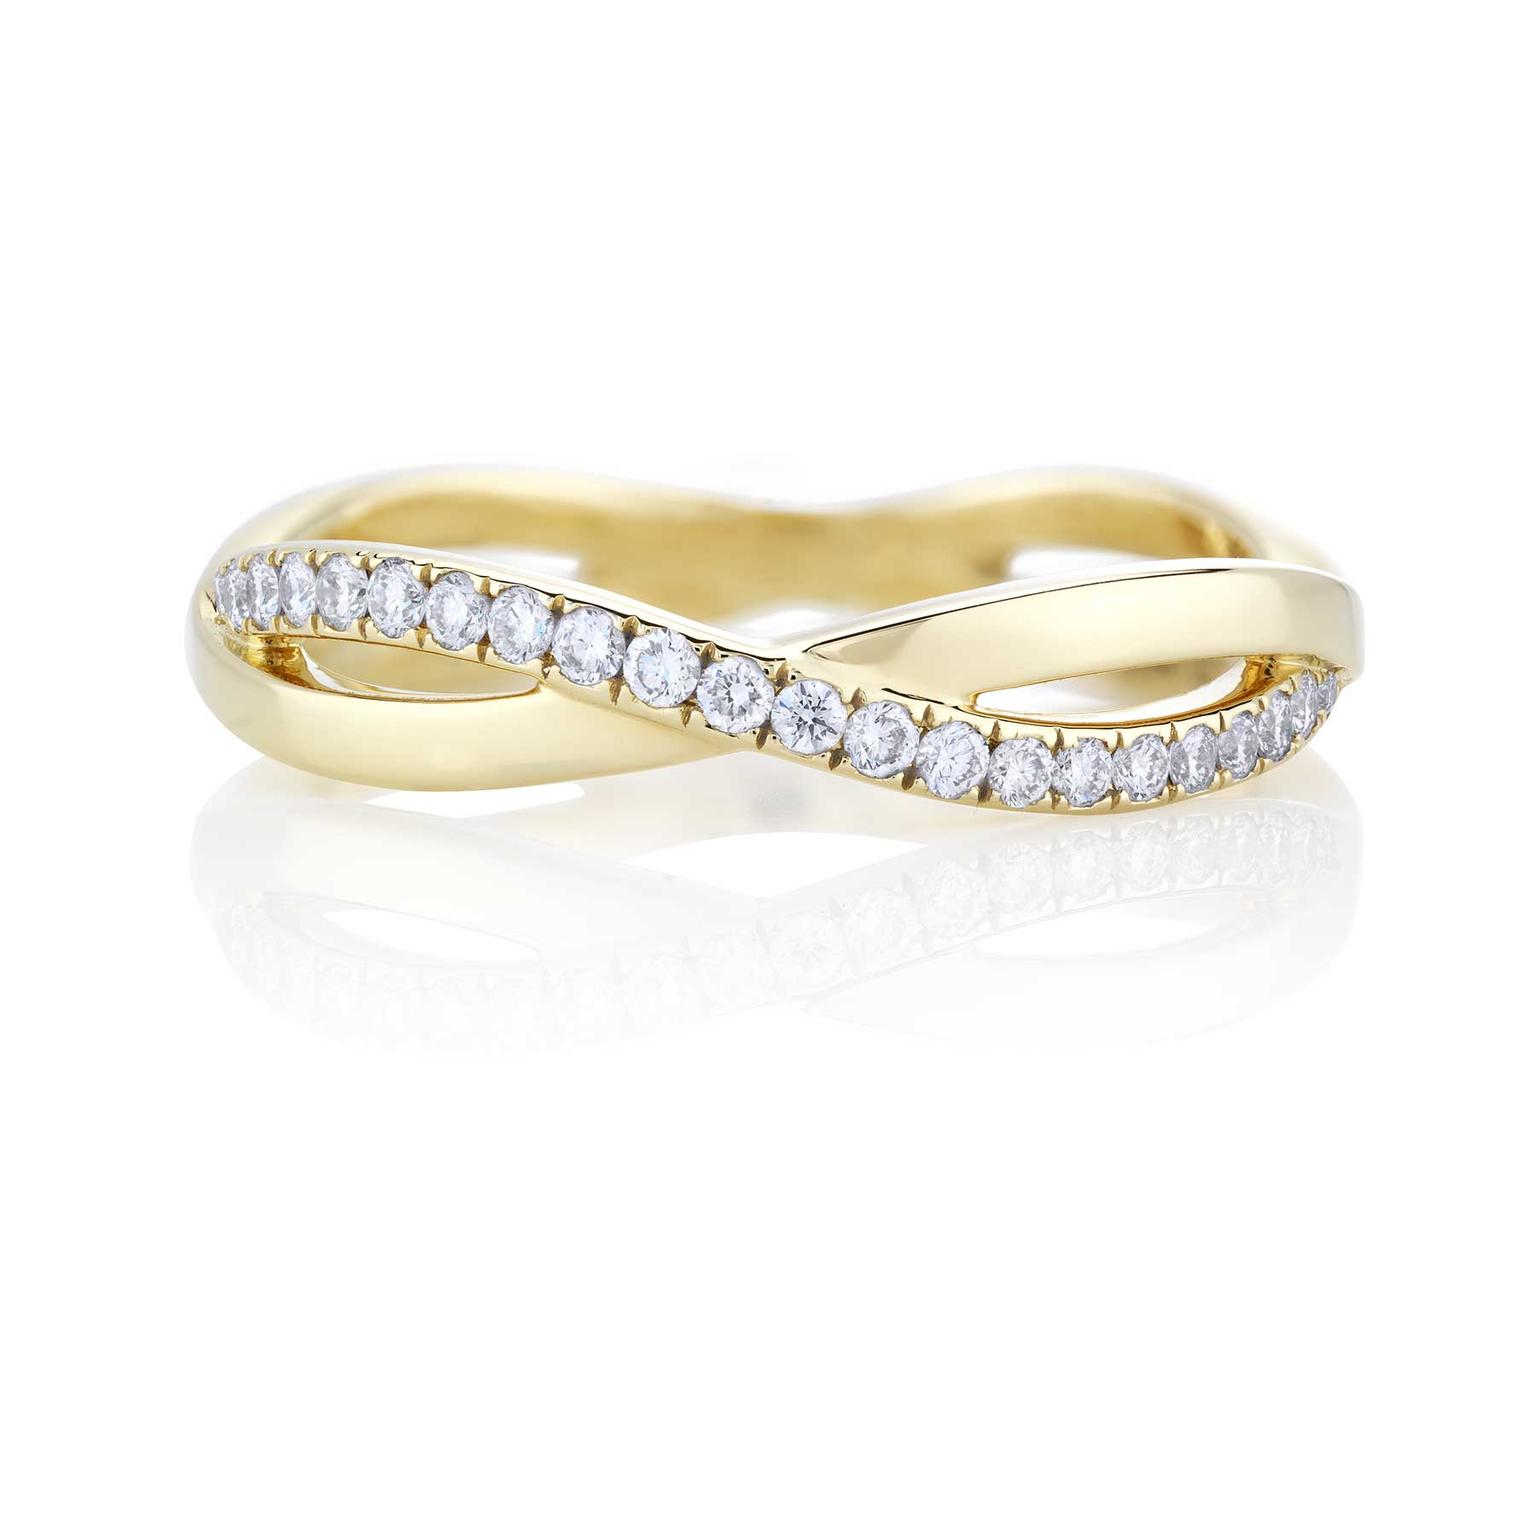 Infinity Yellow Gold And Diamond Wedding Band